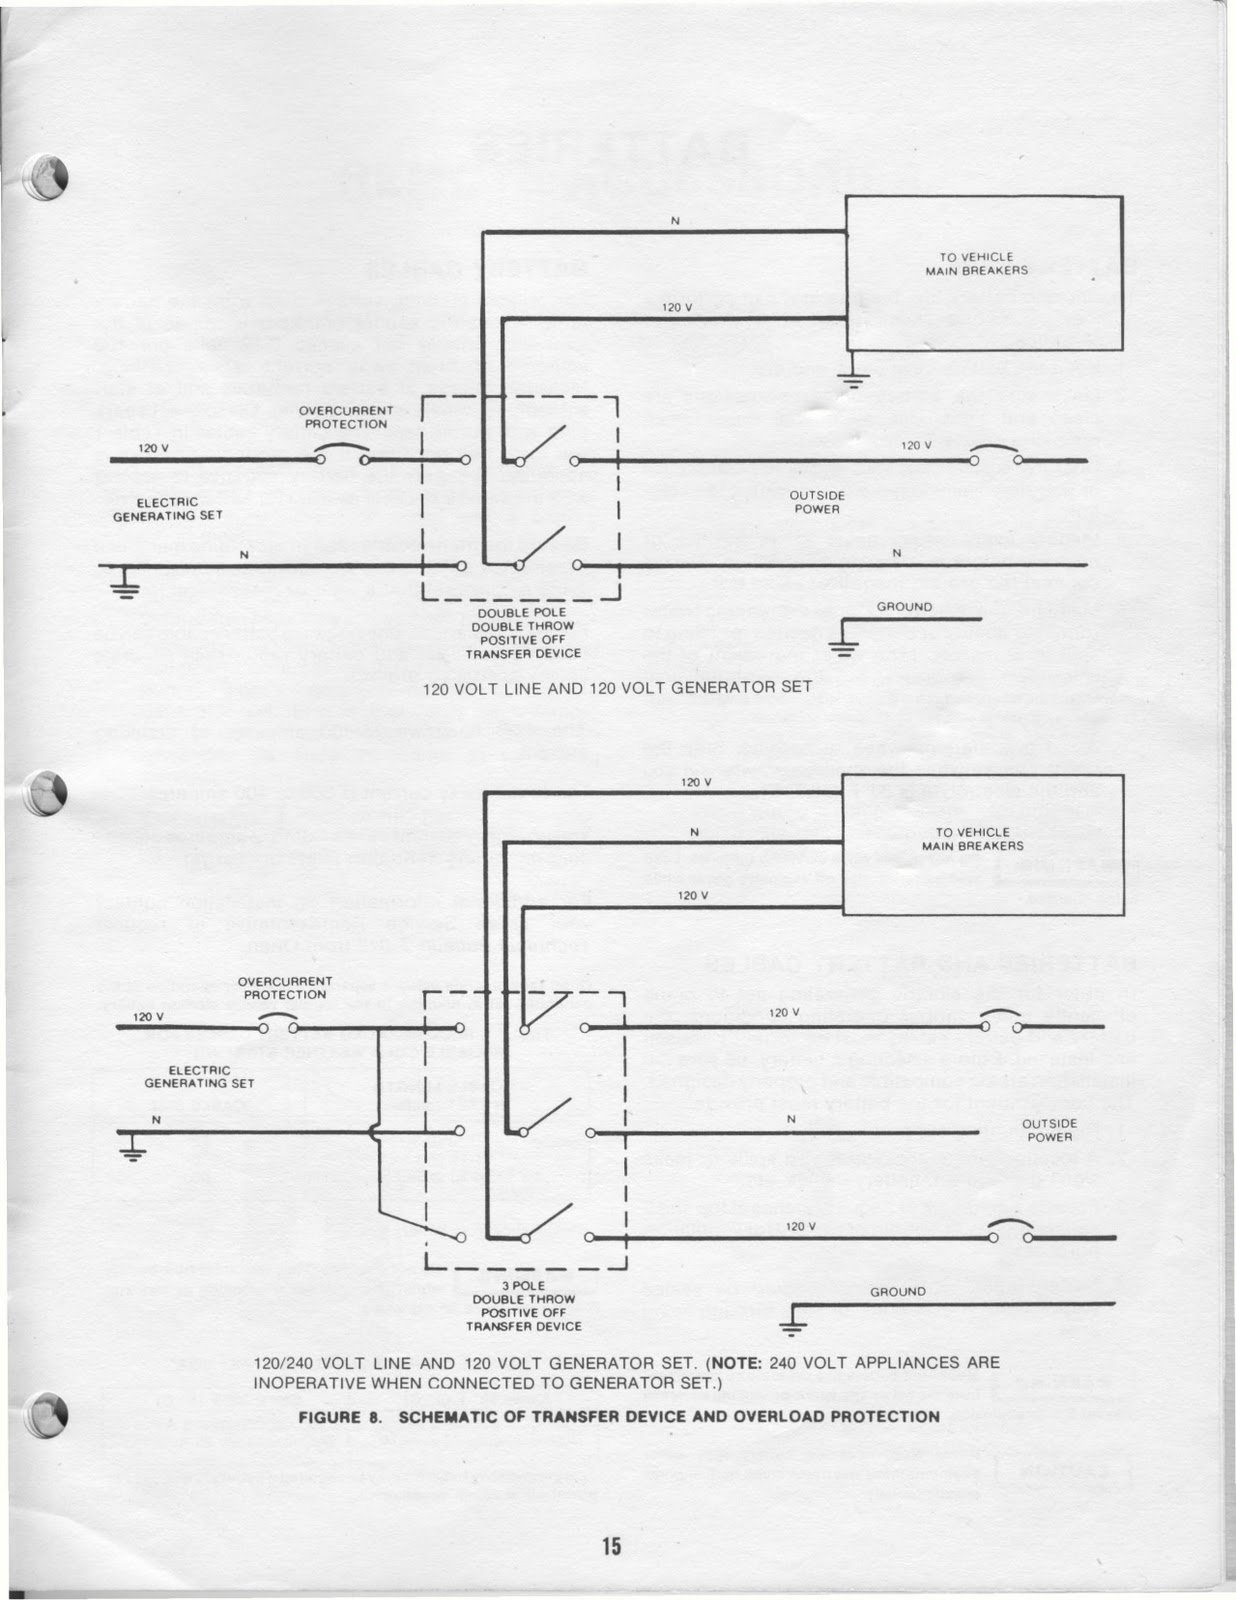 small resolution of onan nh manual onan manual genuine onan n ignition coil kit includes coil bracket misc hardware etc replaces onan coil n bge nhe nhd bgm onan models